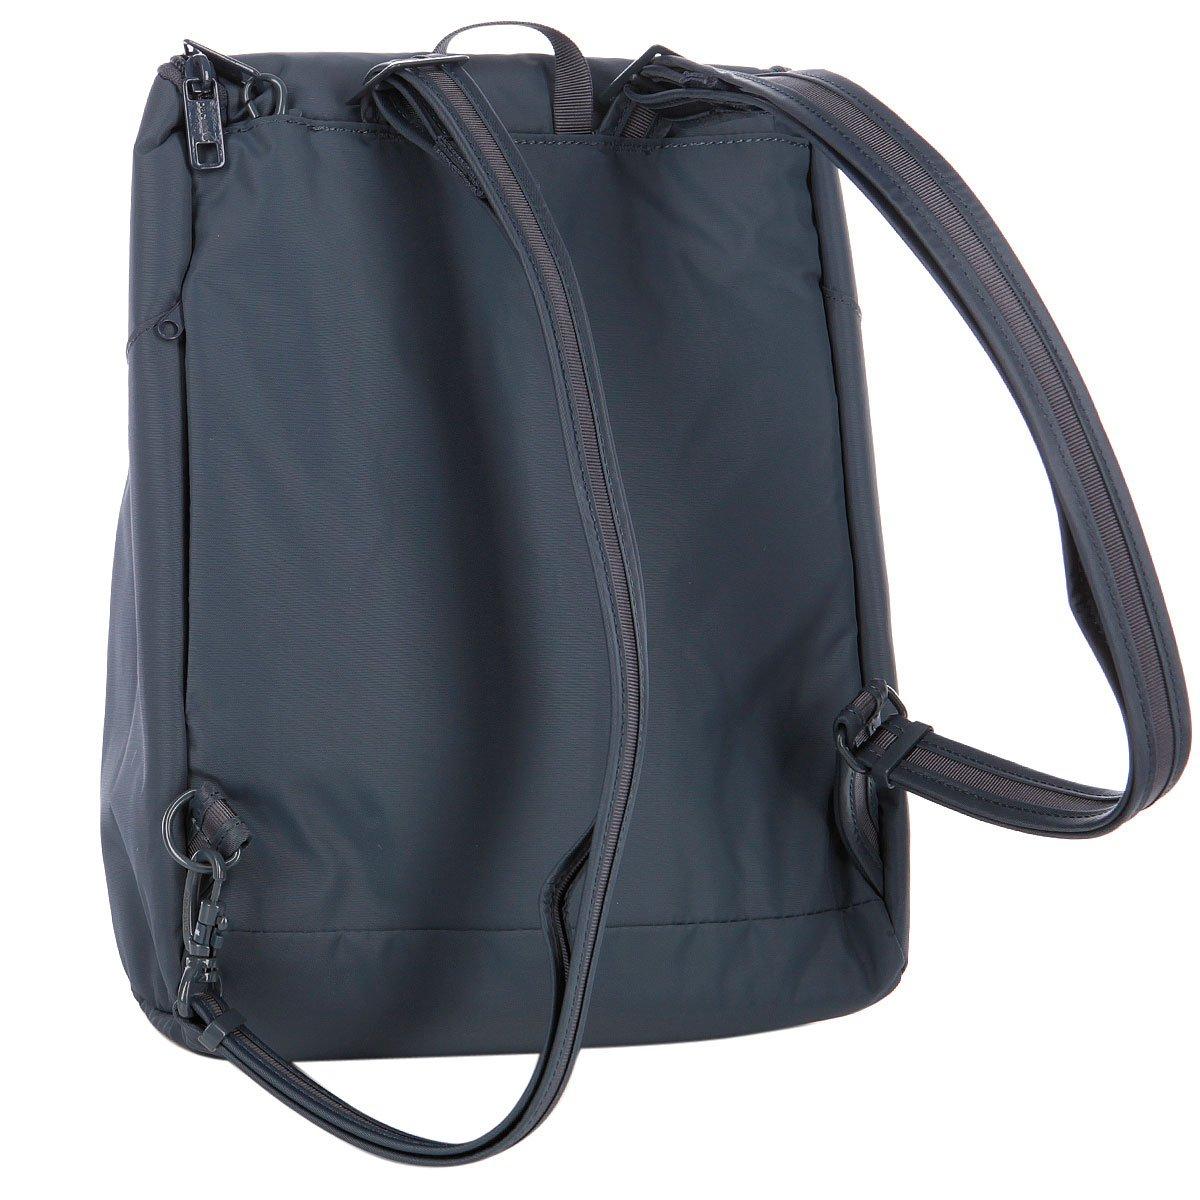 Рюкзак pacsafe citysafe 350 gii продам детский рюкзак на колесах